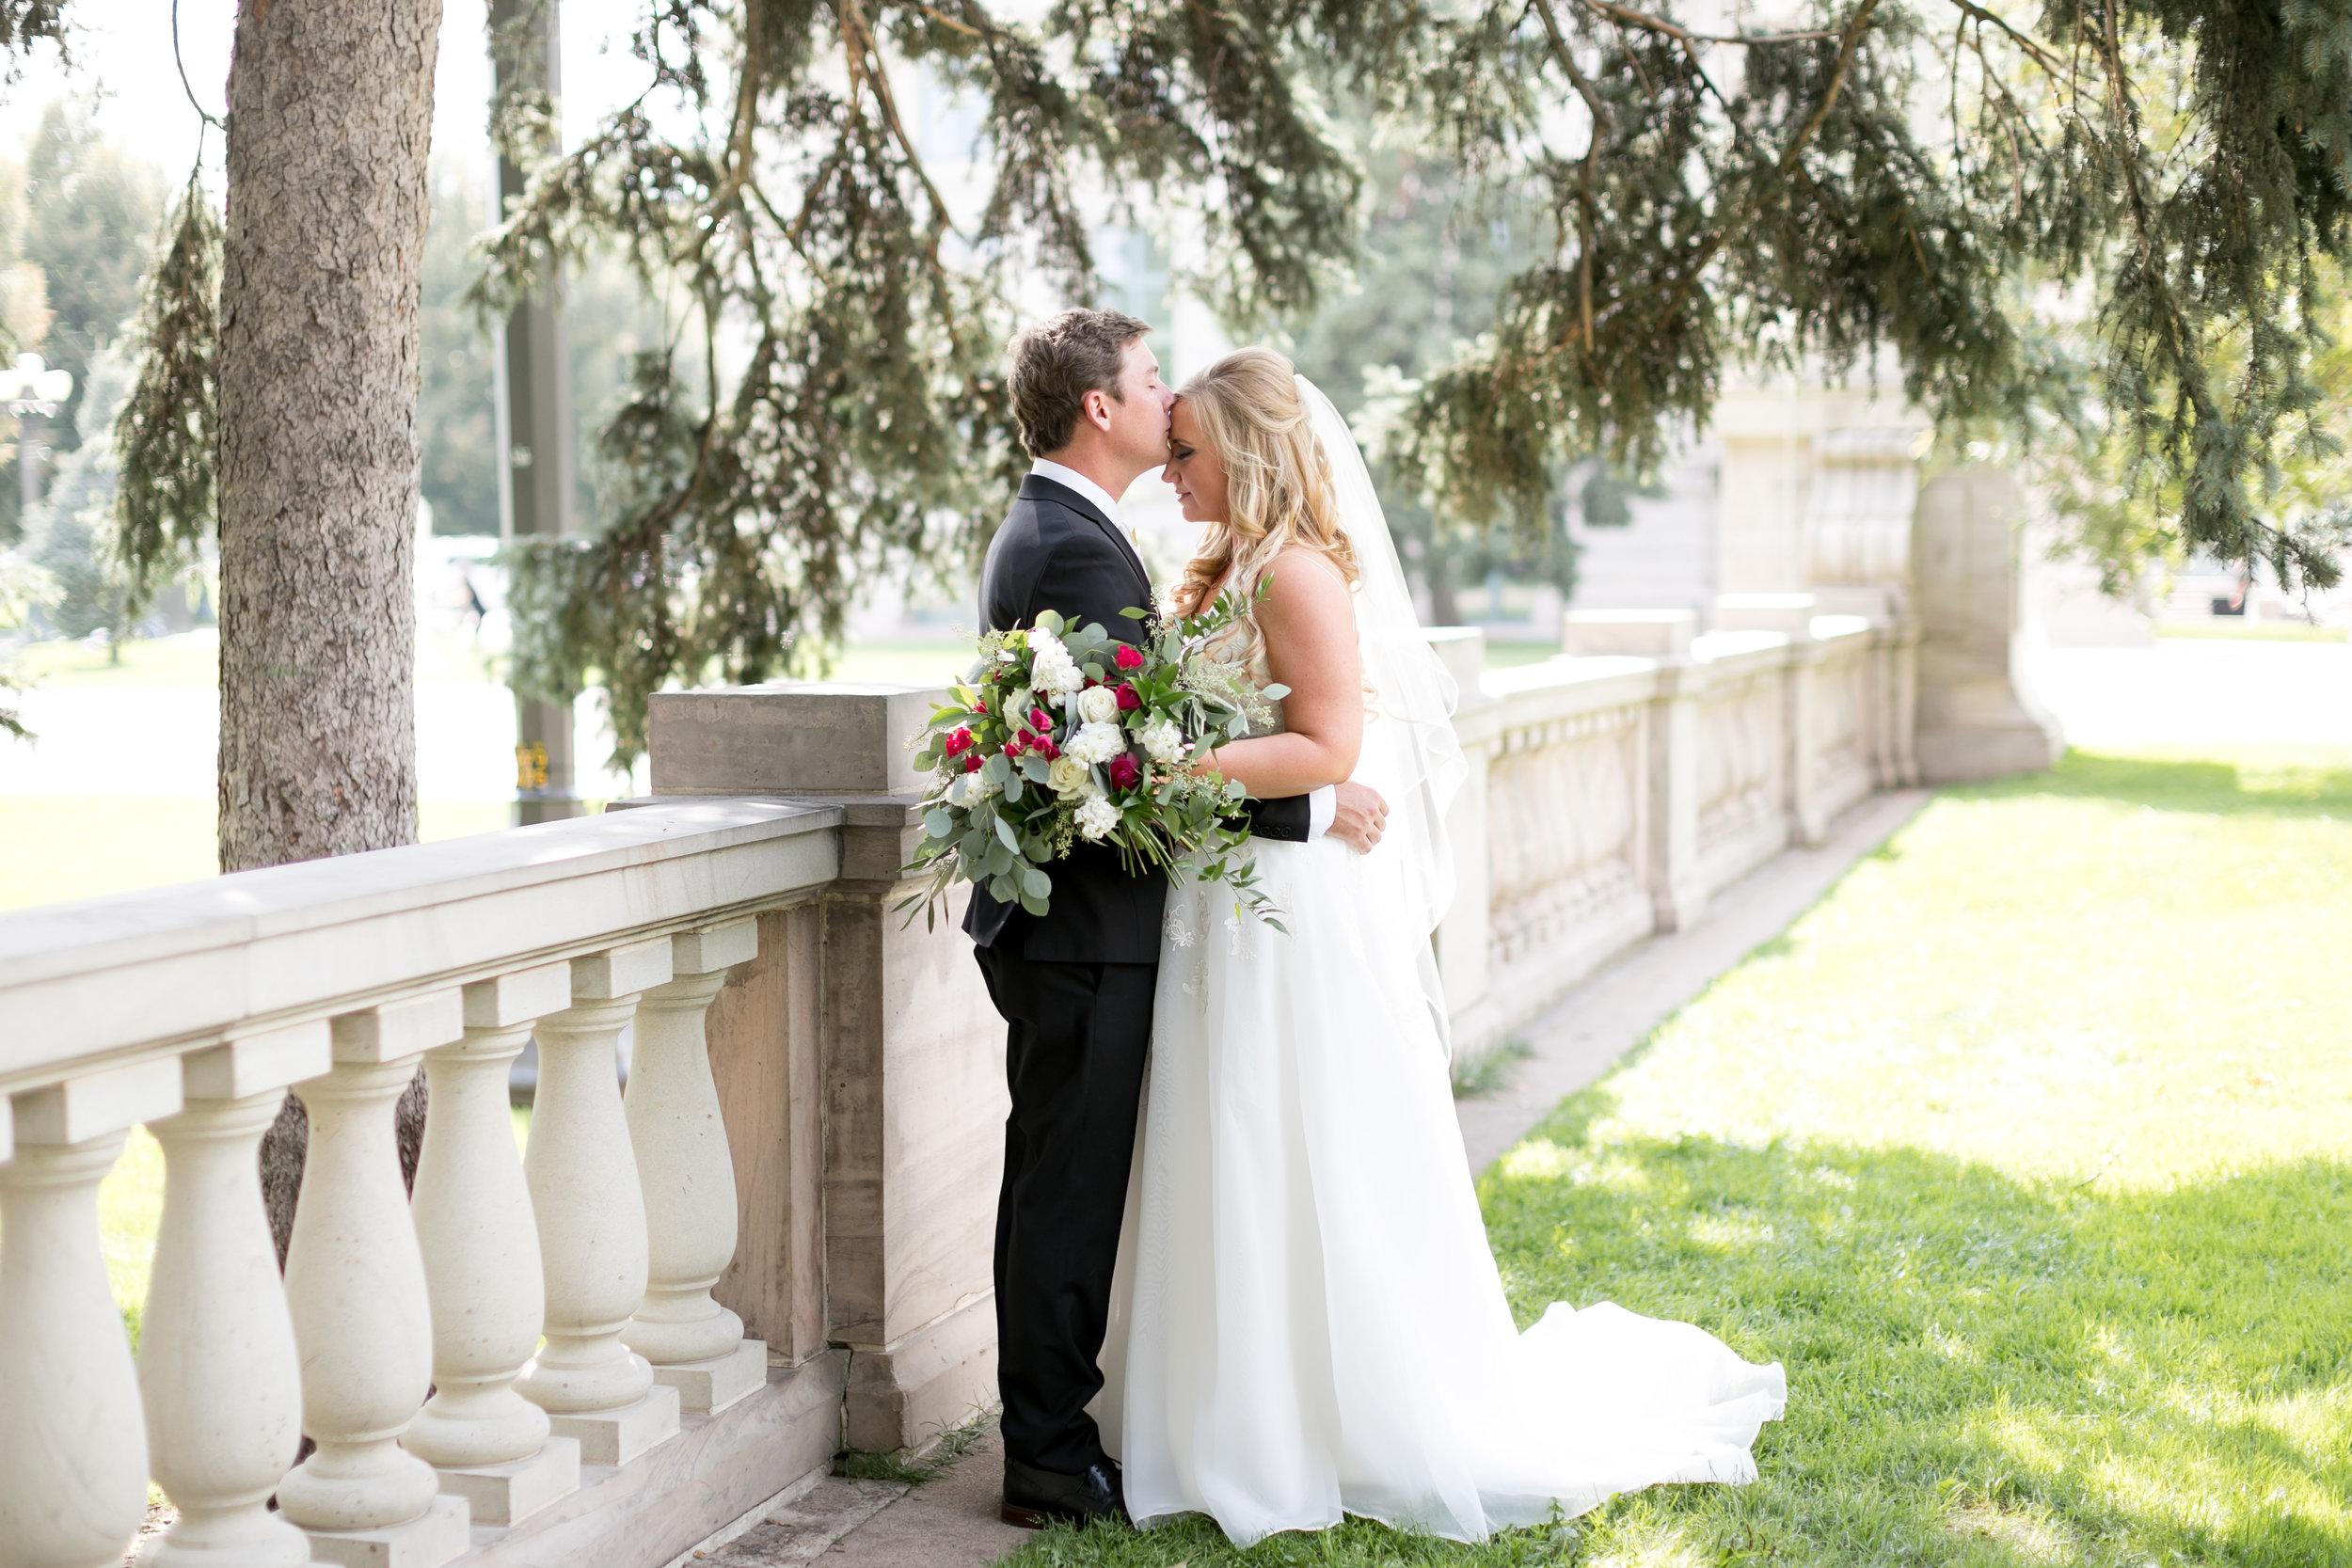 city-chic-downtown-denver-park-wedding23.jpg